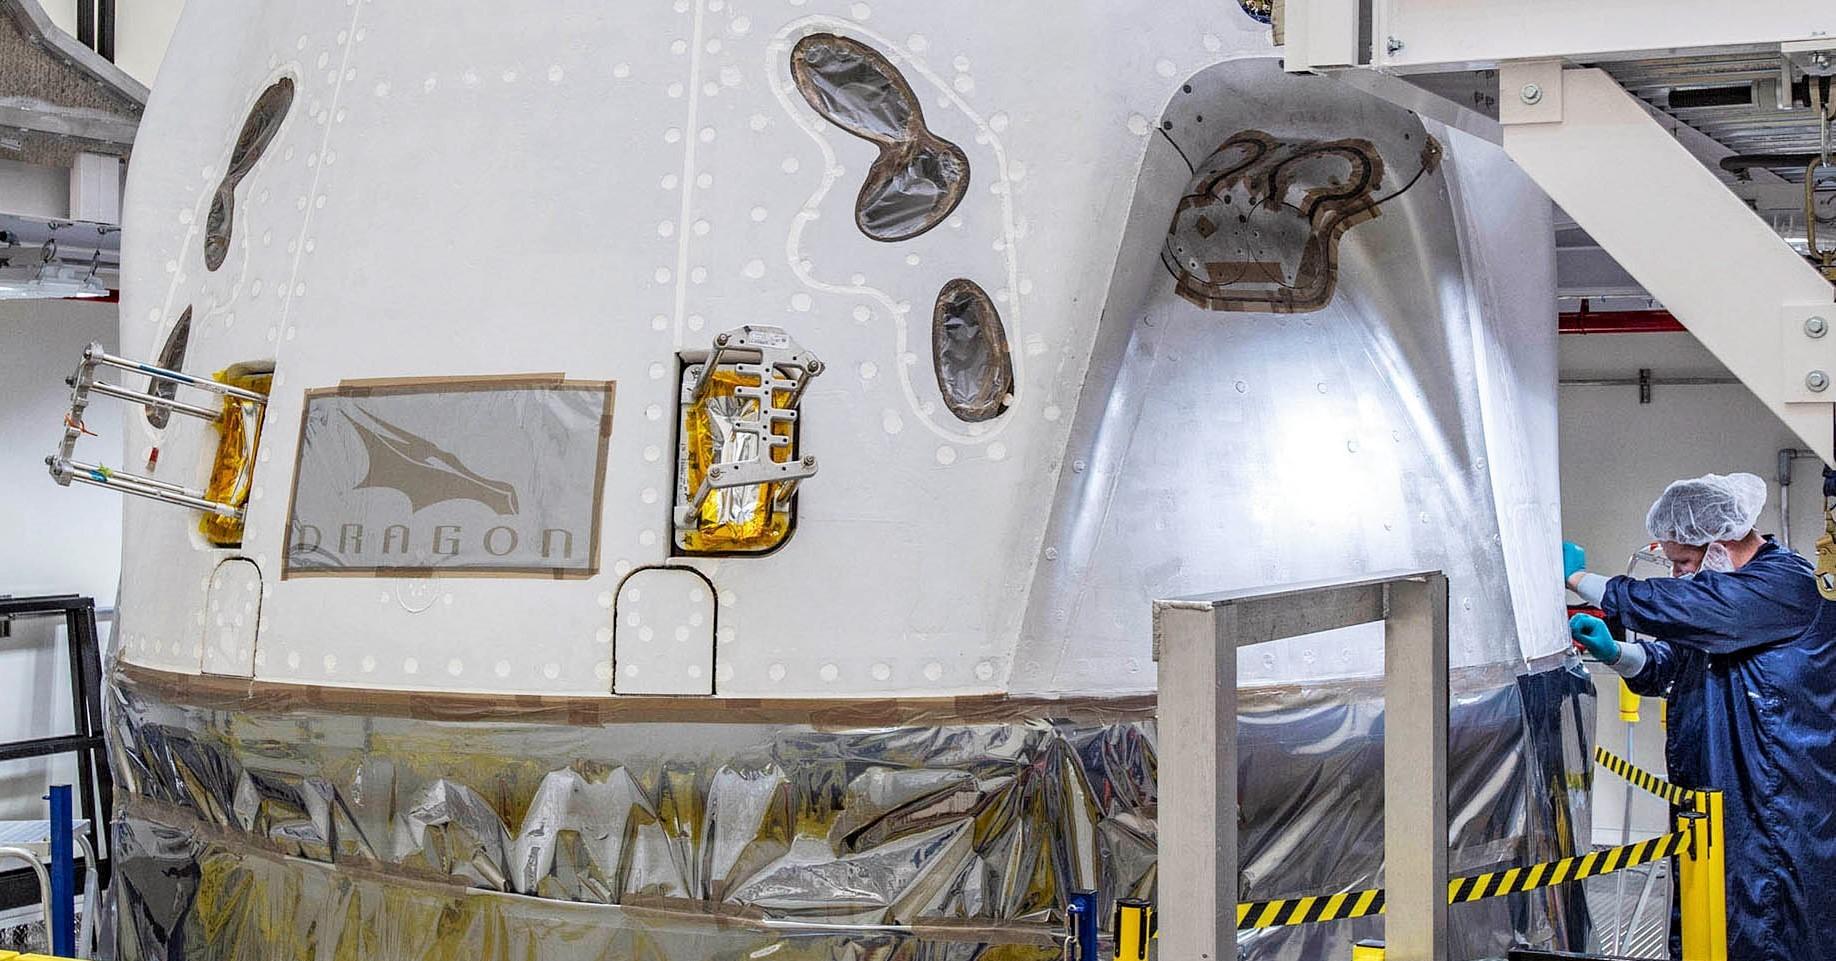 Crew Dragon Crew-1 capsule C207 KSC Oct 2020 (SpaceX) 1 crop